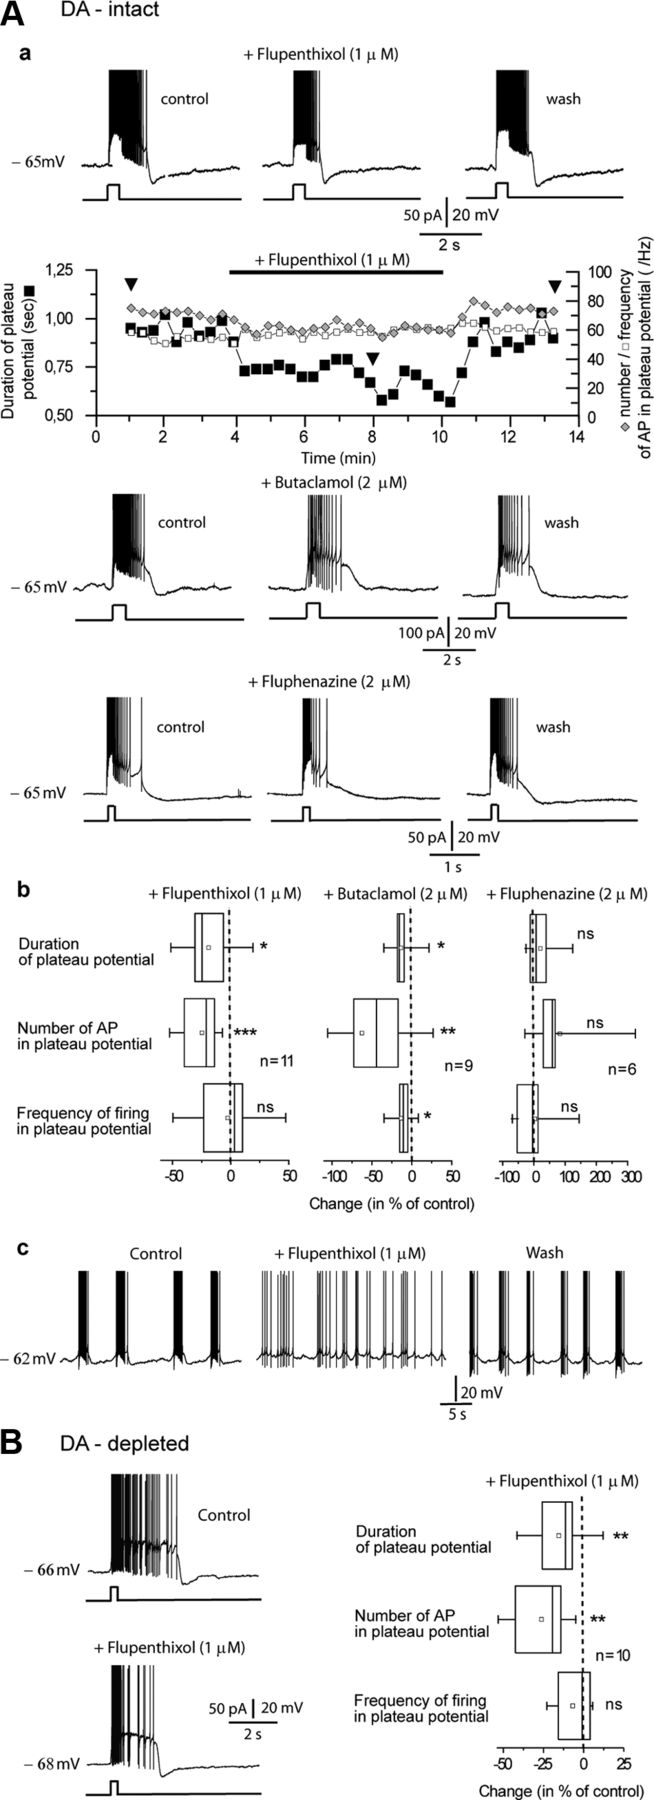 Inhibiting Subthalamic D5 Receptor Constitutive Activity Alleviates Circuit Diagram Of Digital Isolation And Termination Download Figure